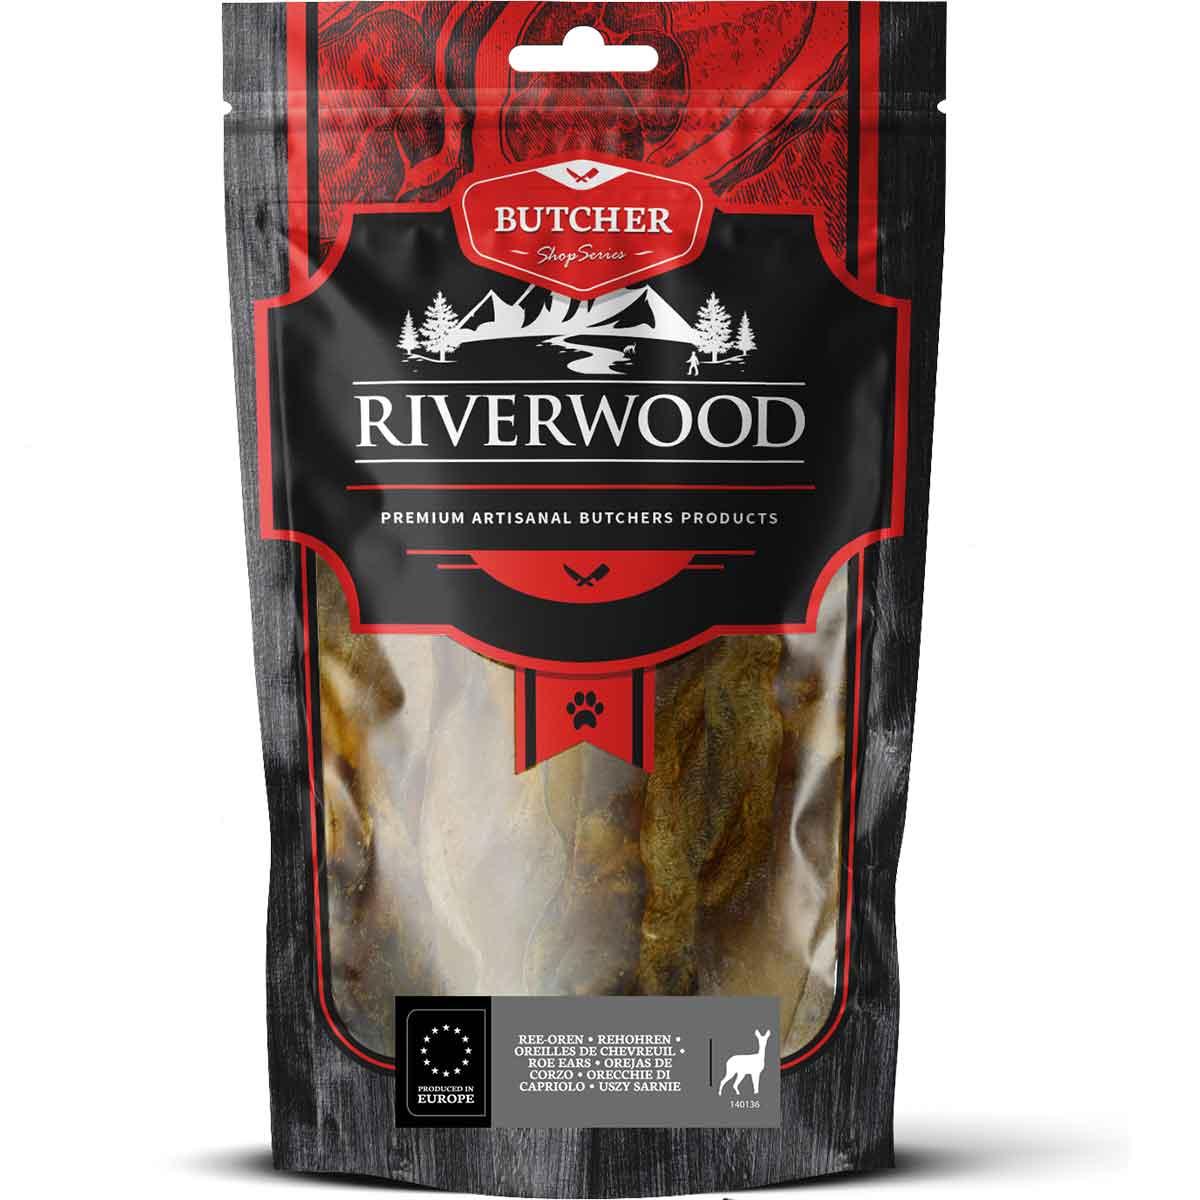 Riverwood Ree-oren